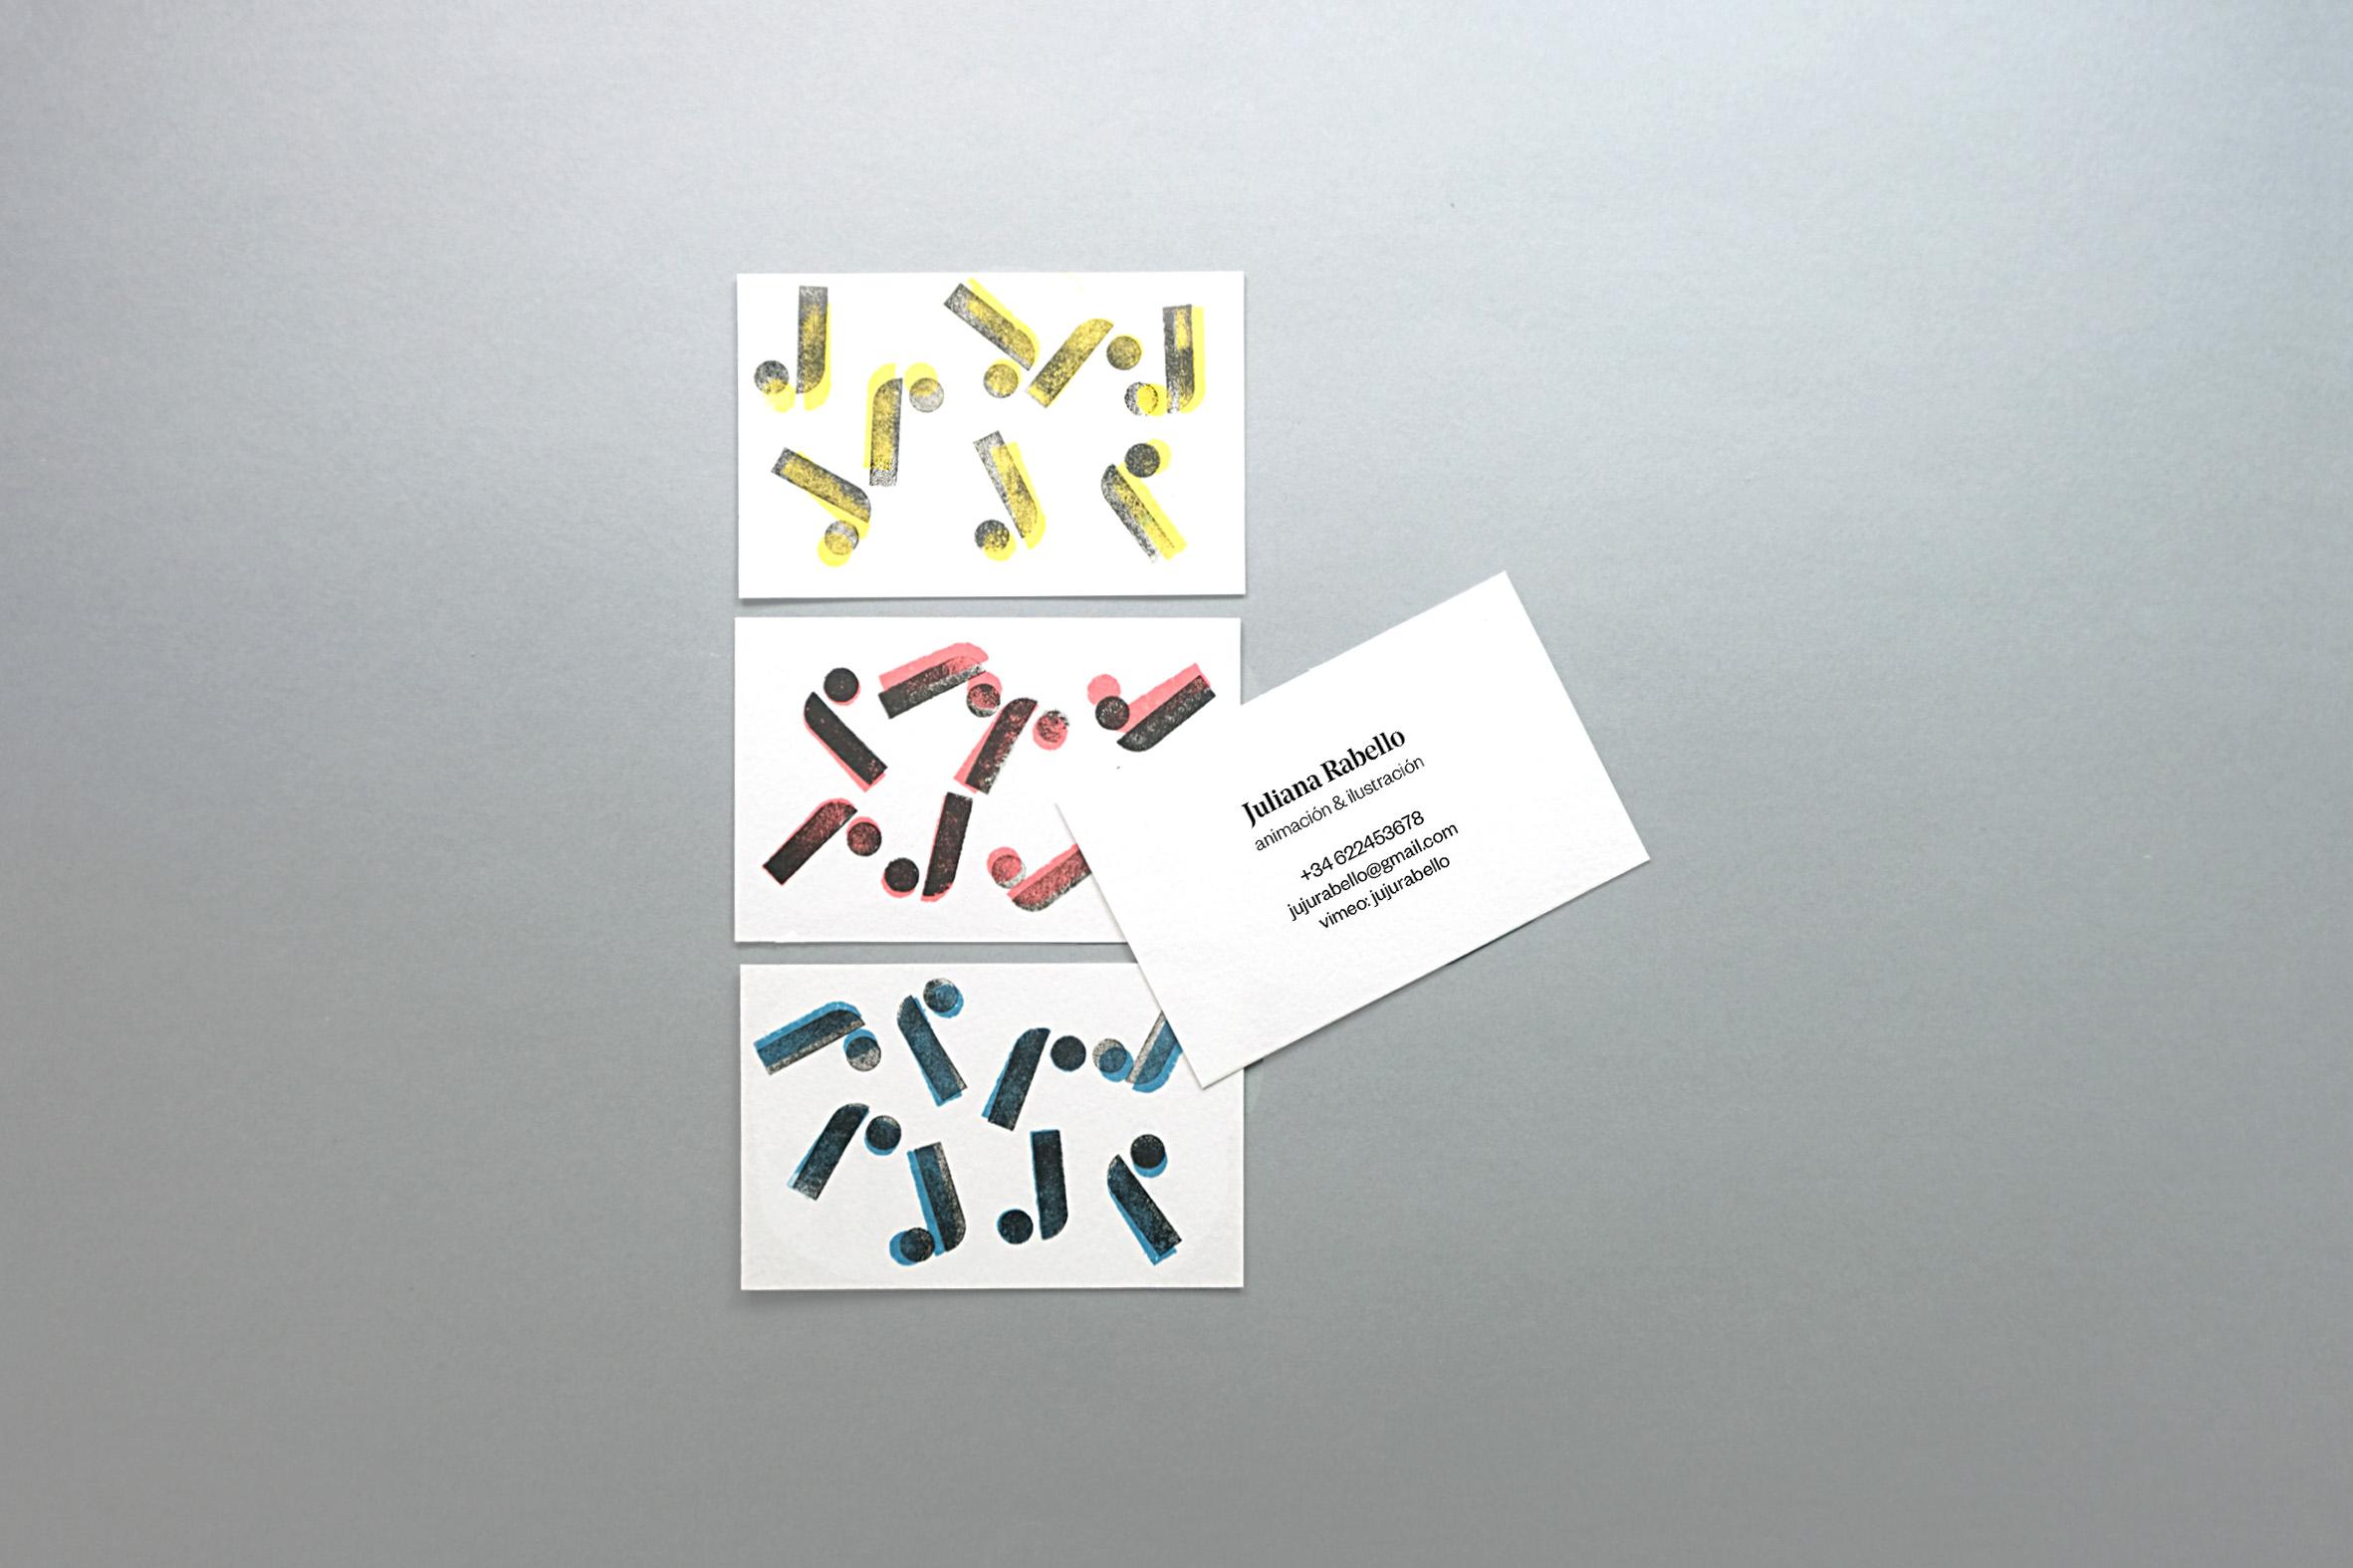 Cartao-cores-Juliana-Rabello-danielcavalcanti.com_